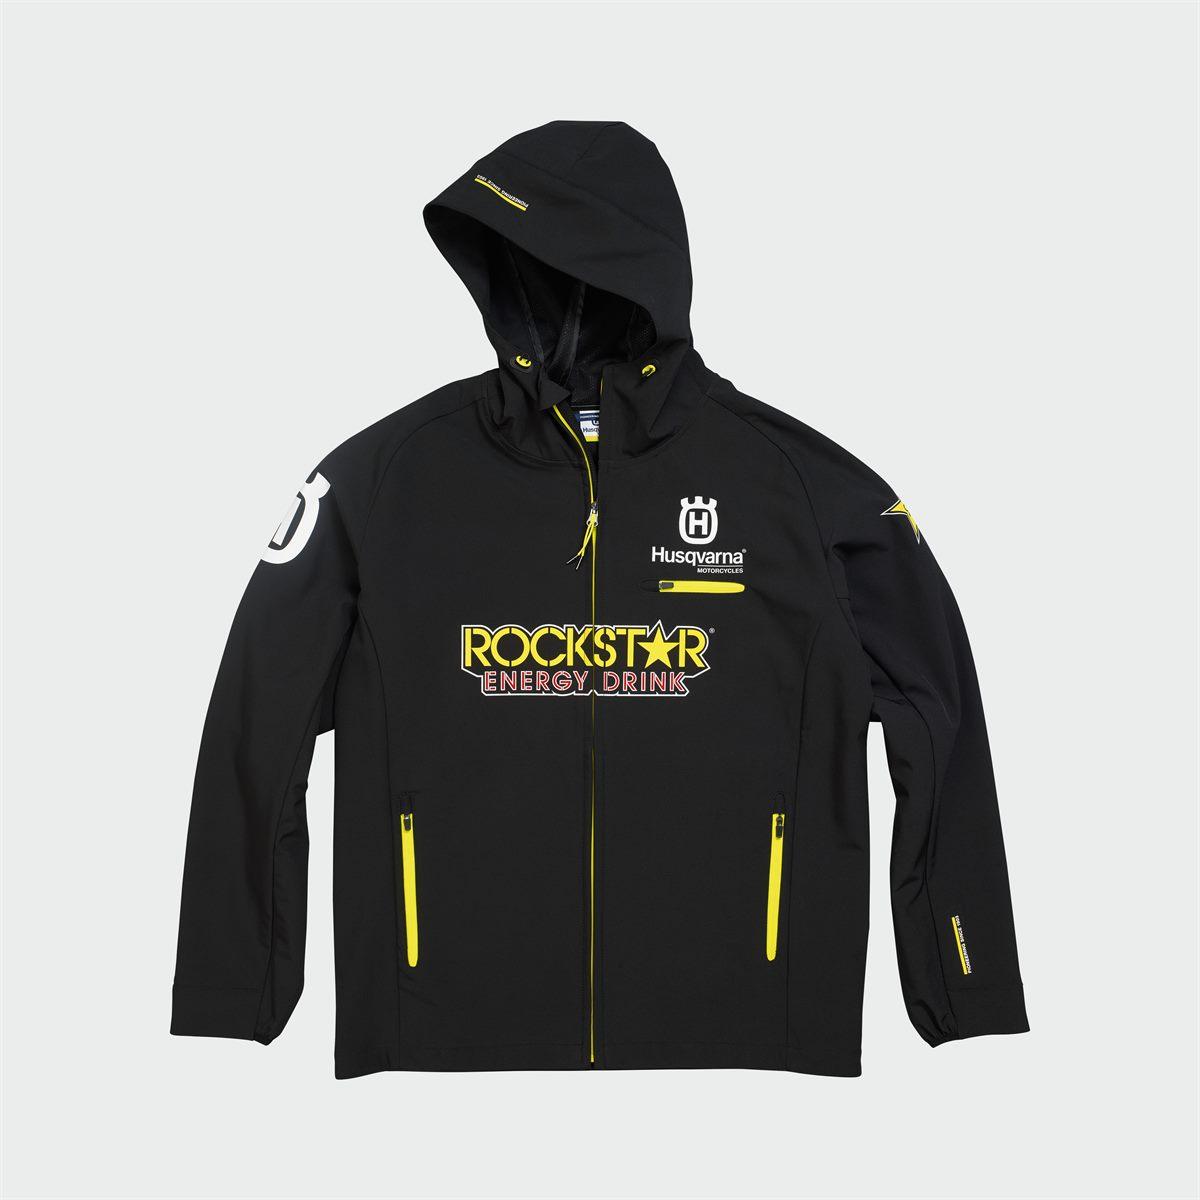 2019 Rockstar Energy Husqvarna Factory Racing Casual Clothing Collection - RS REPLICA HARDSHELL JACKET